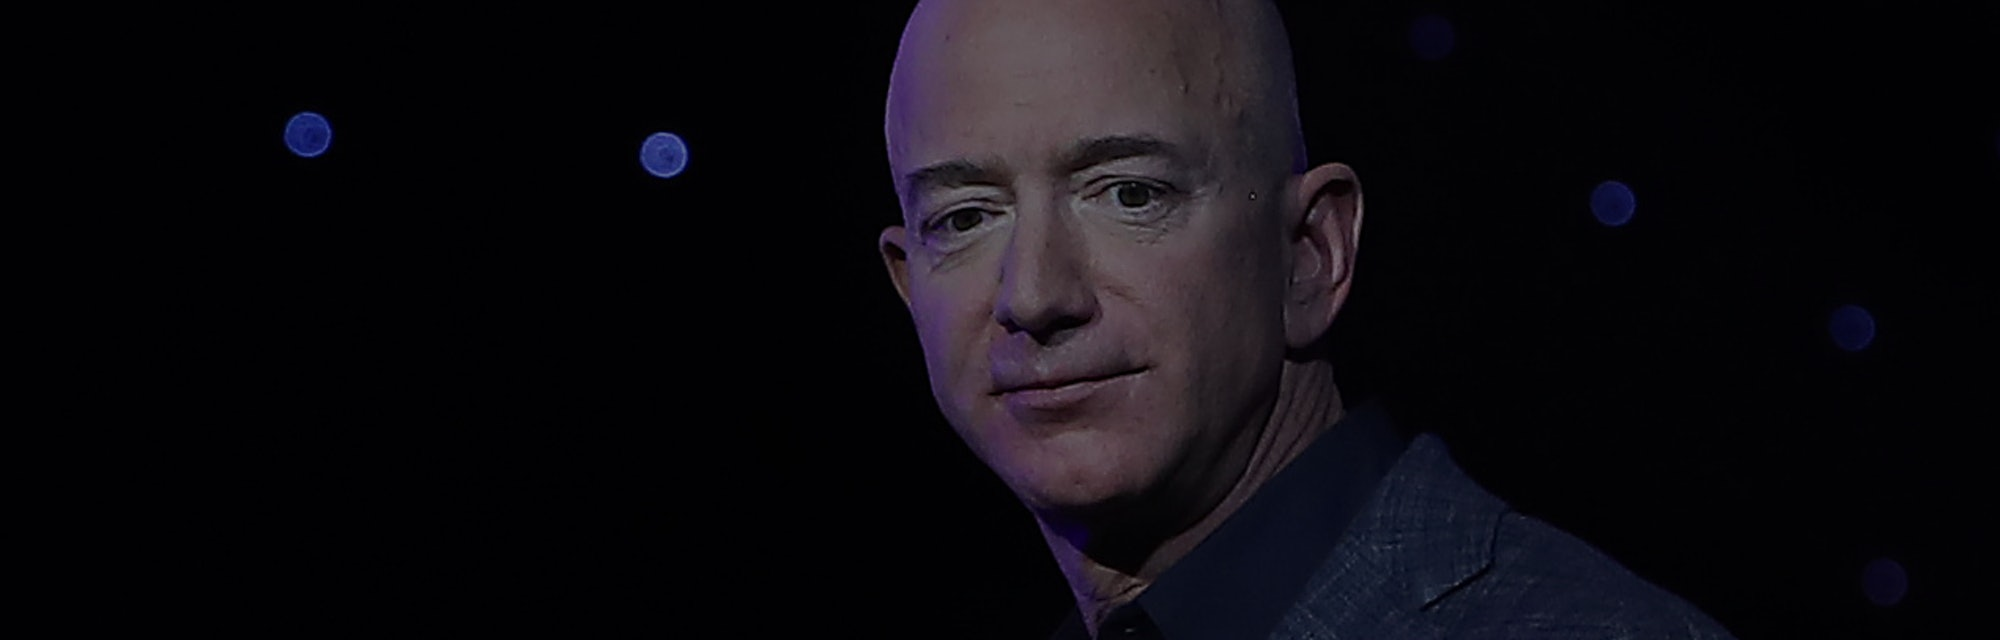 WASHINGTON, DC - MAY 09: Jeff Bezos, owner of Blue Origin, introduces a new lunar landing module cal...